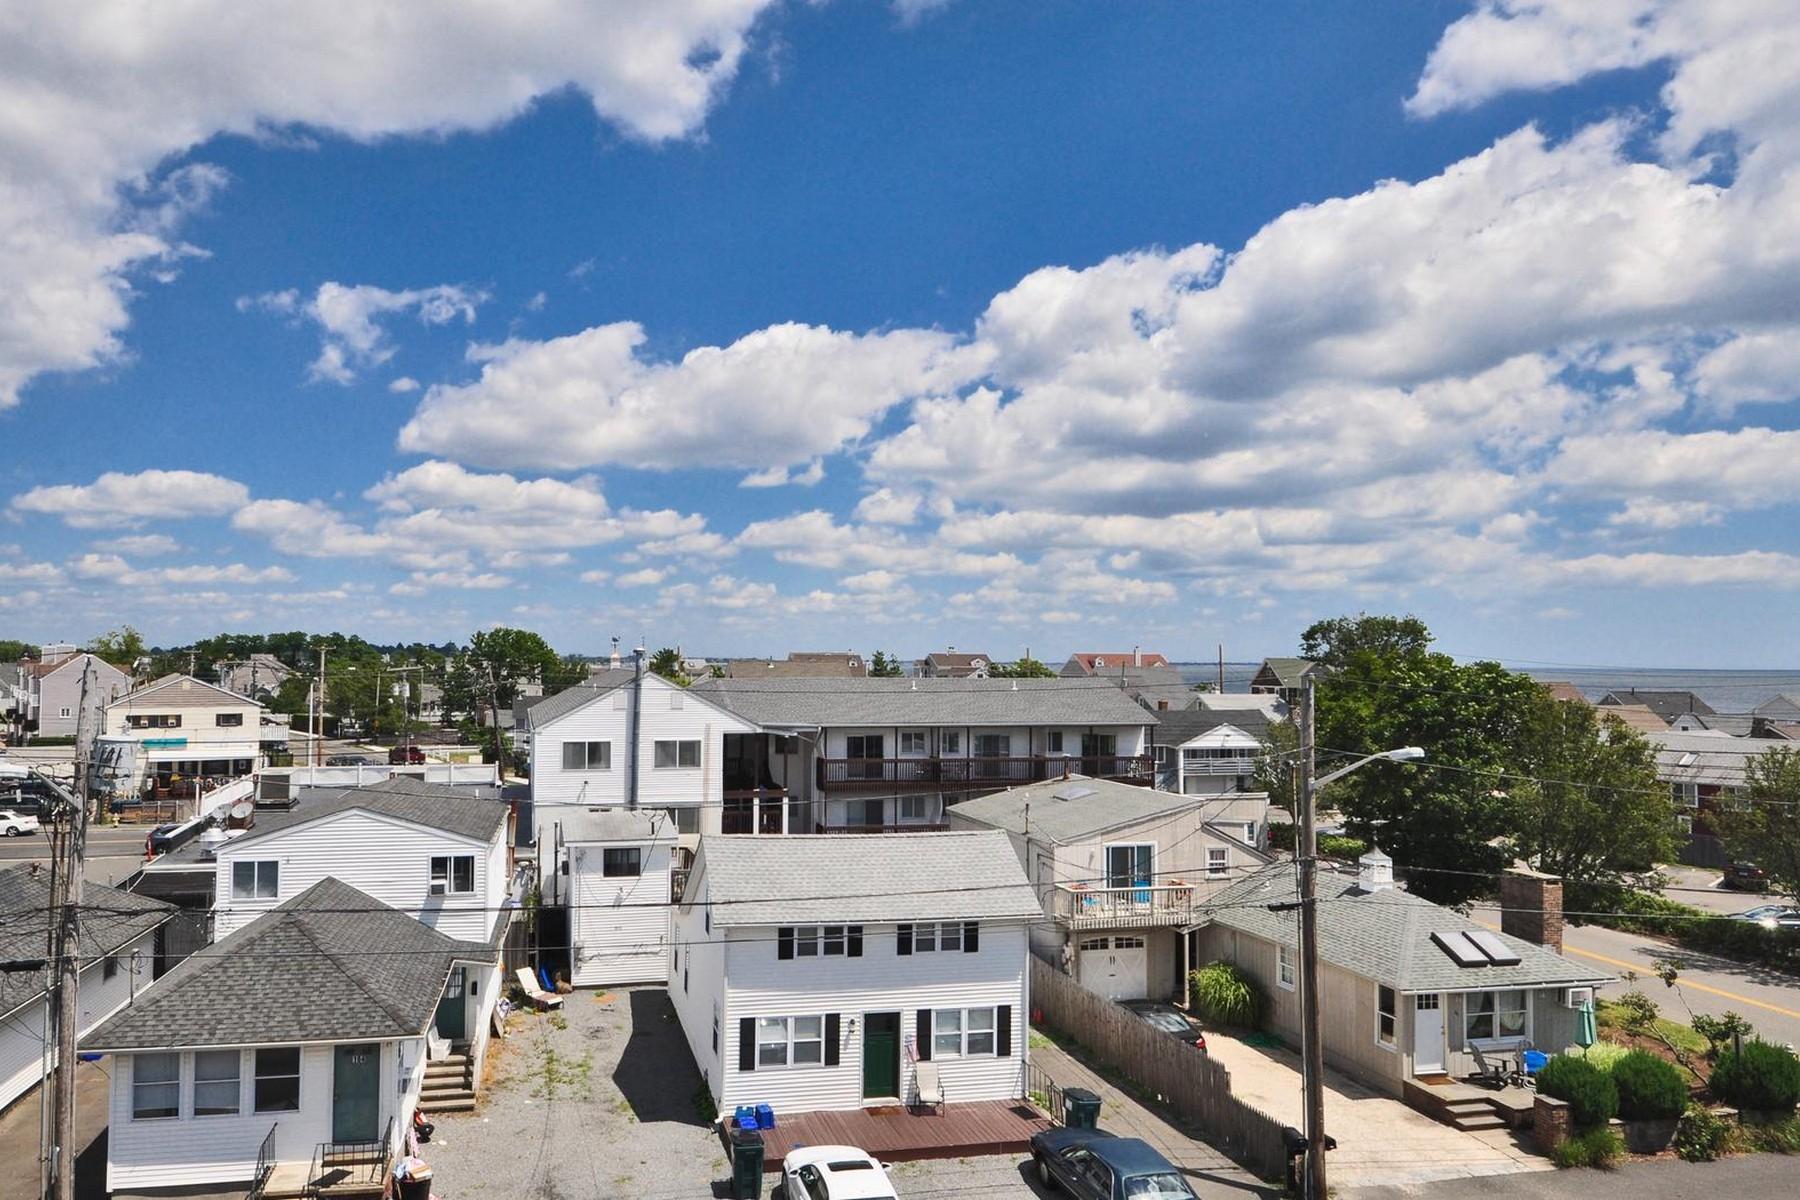 Condominium for Sale at FAIRFIELD BEACH - THE BEACH CONDO 97 College Place 97 Fairfield, Connecticut, 06824 United States